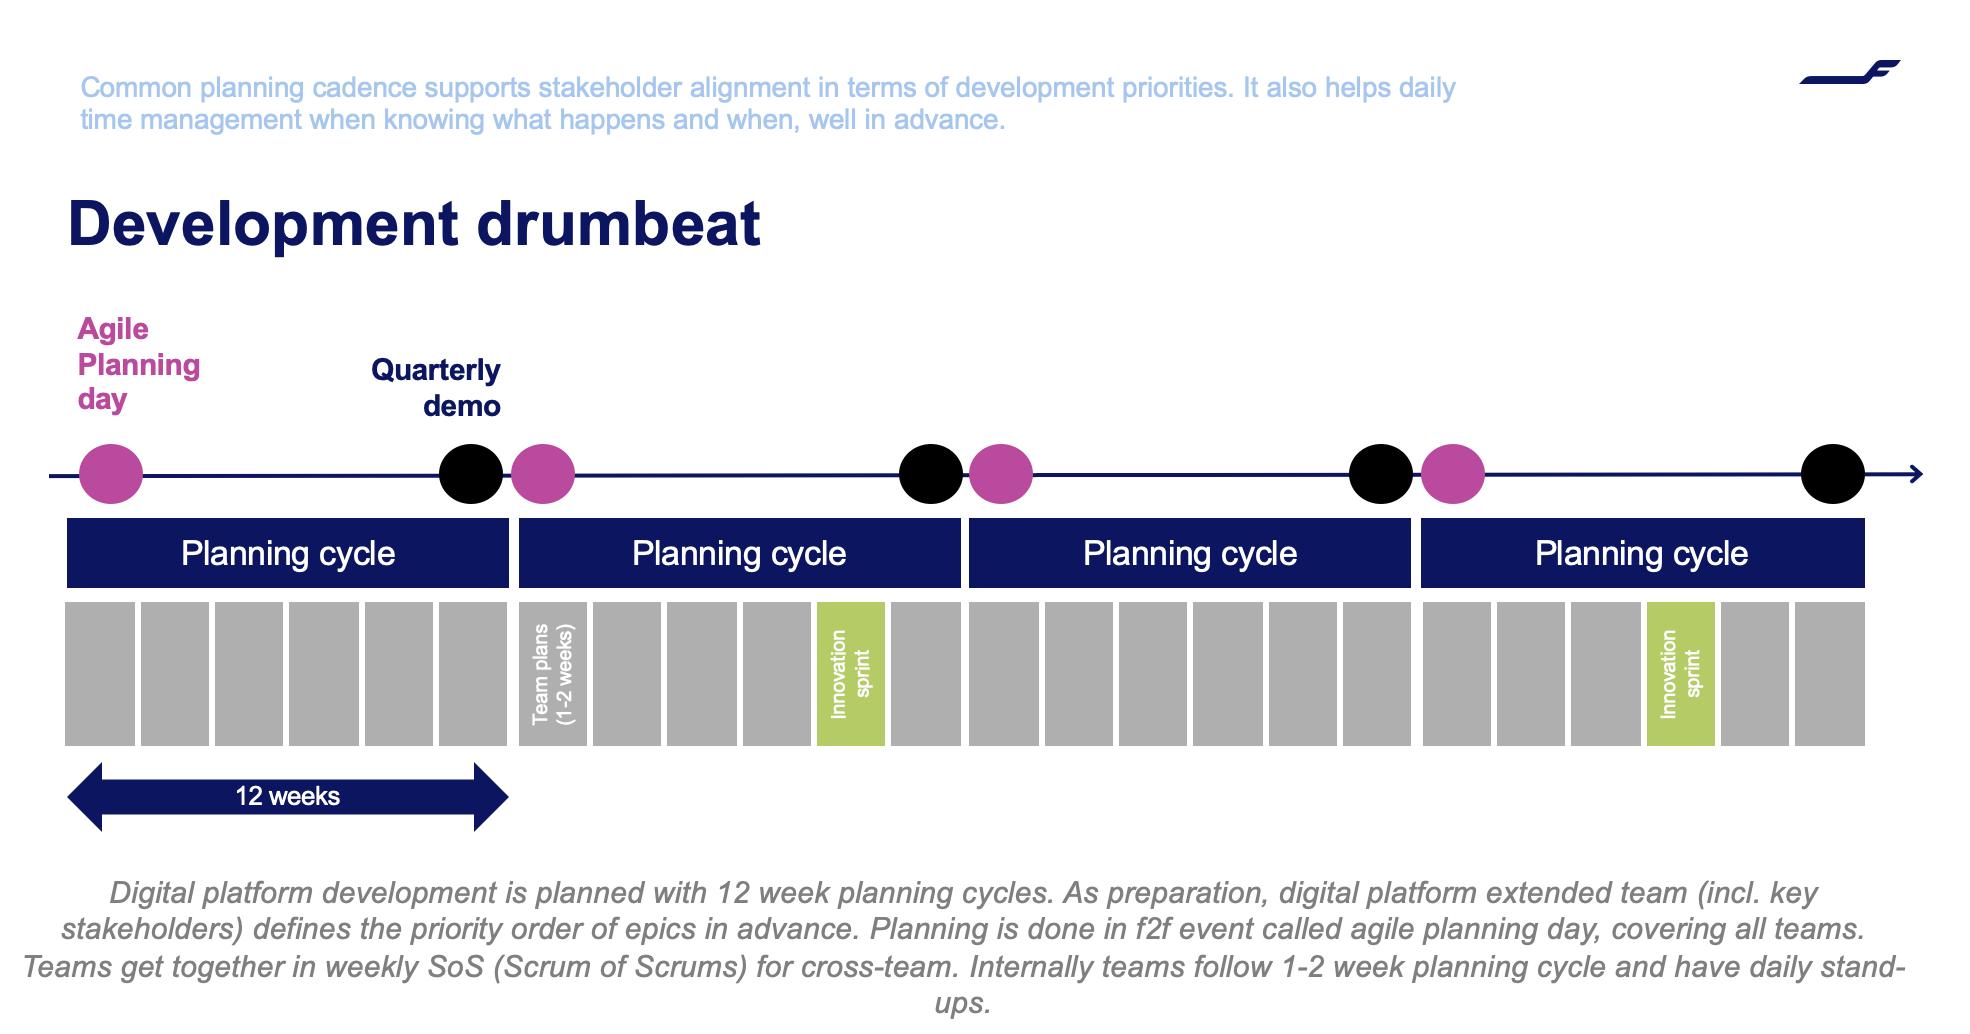 Finnair digital transformation - product development process